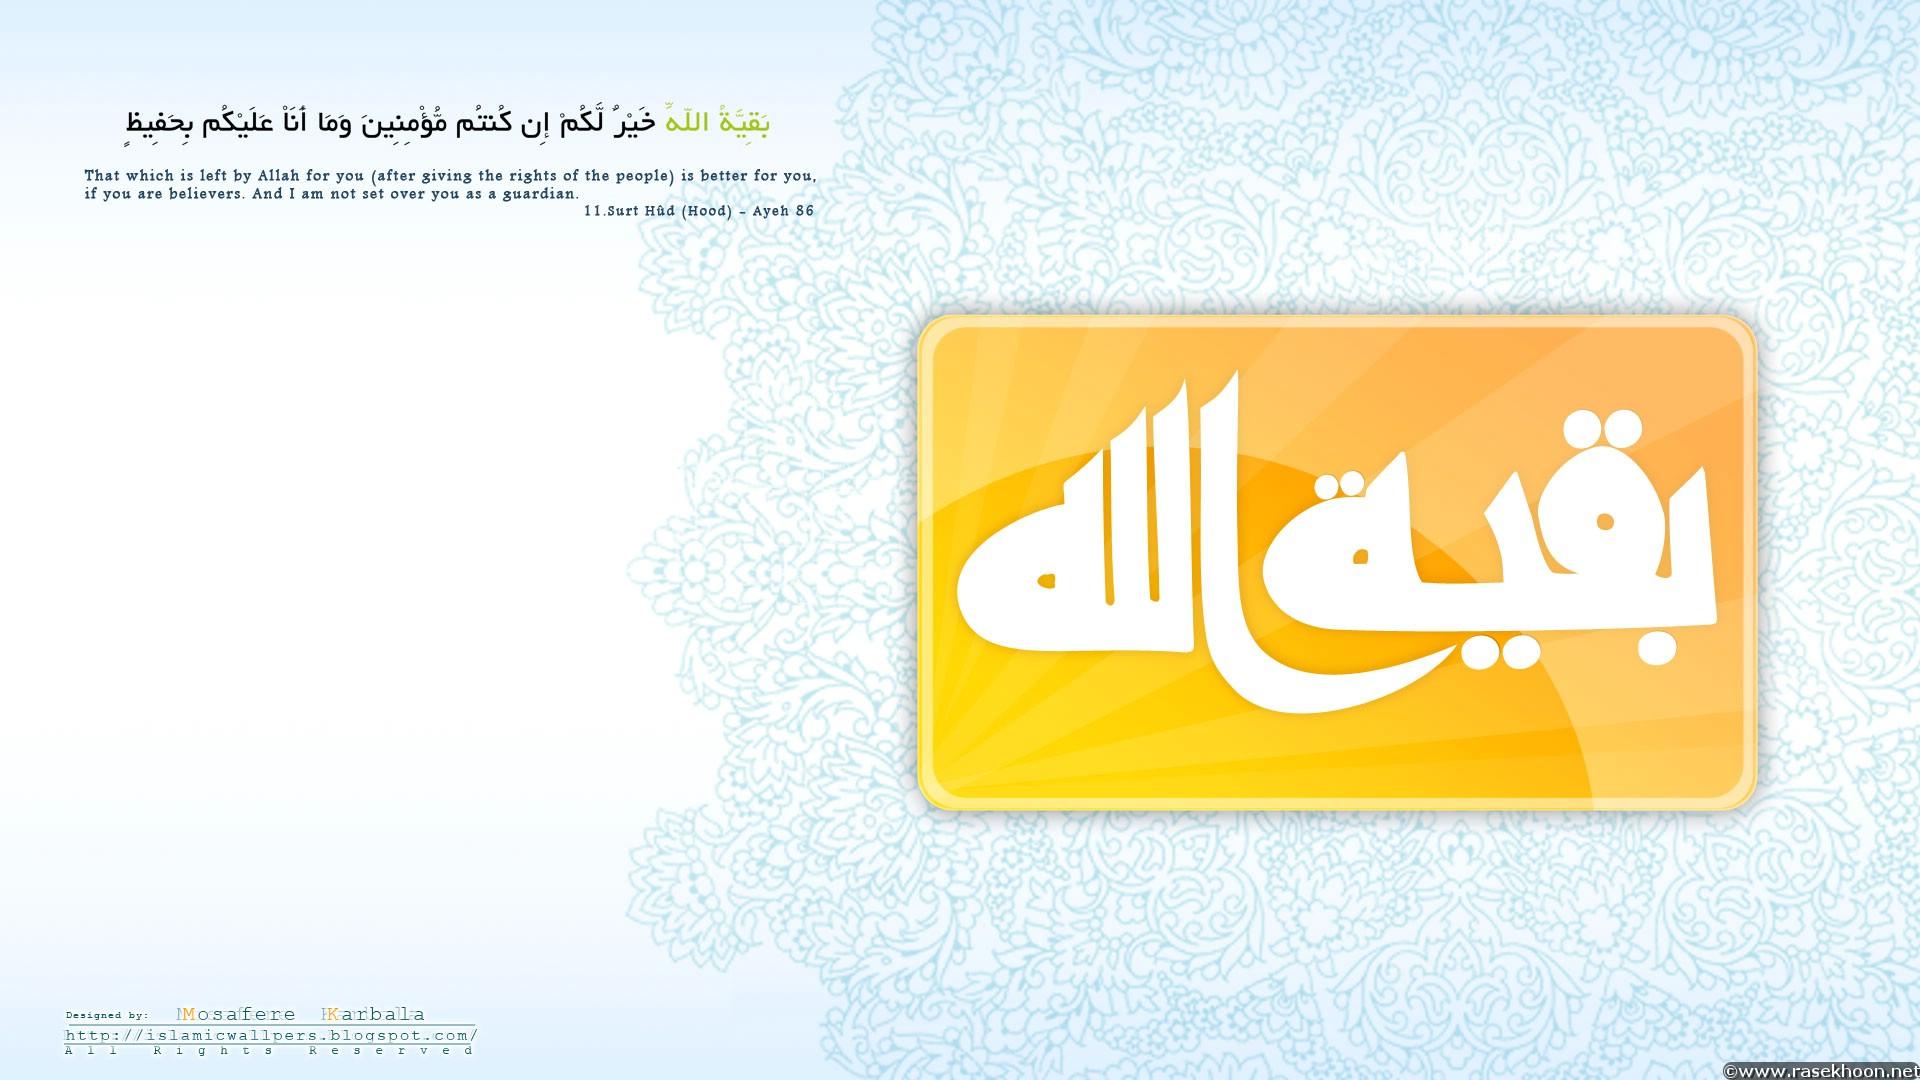 http://s5.picofile.com/file/8126623418/Cart_Postale_Emame_Zaman_RadsMs_com_17.jpg